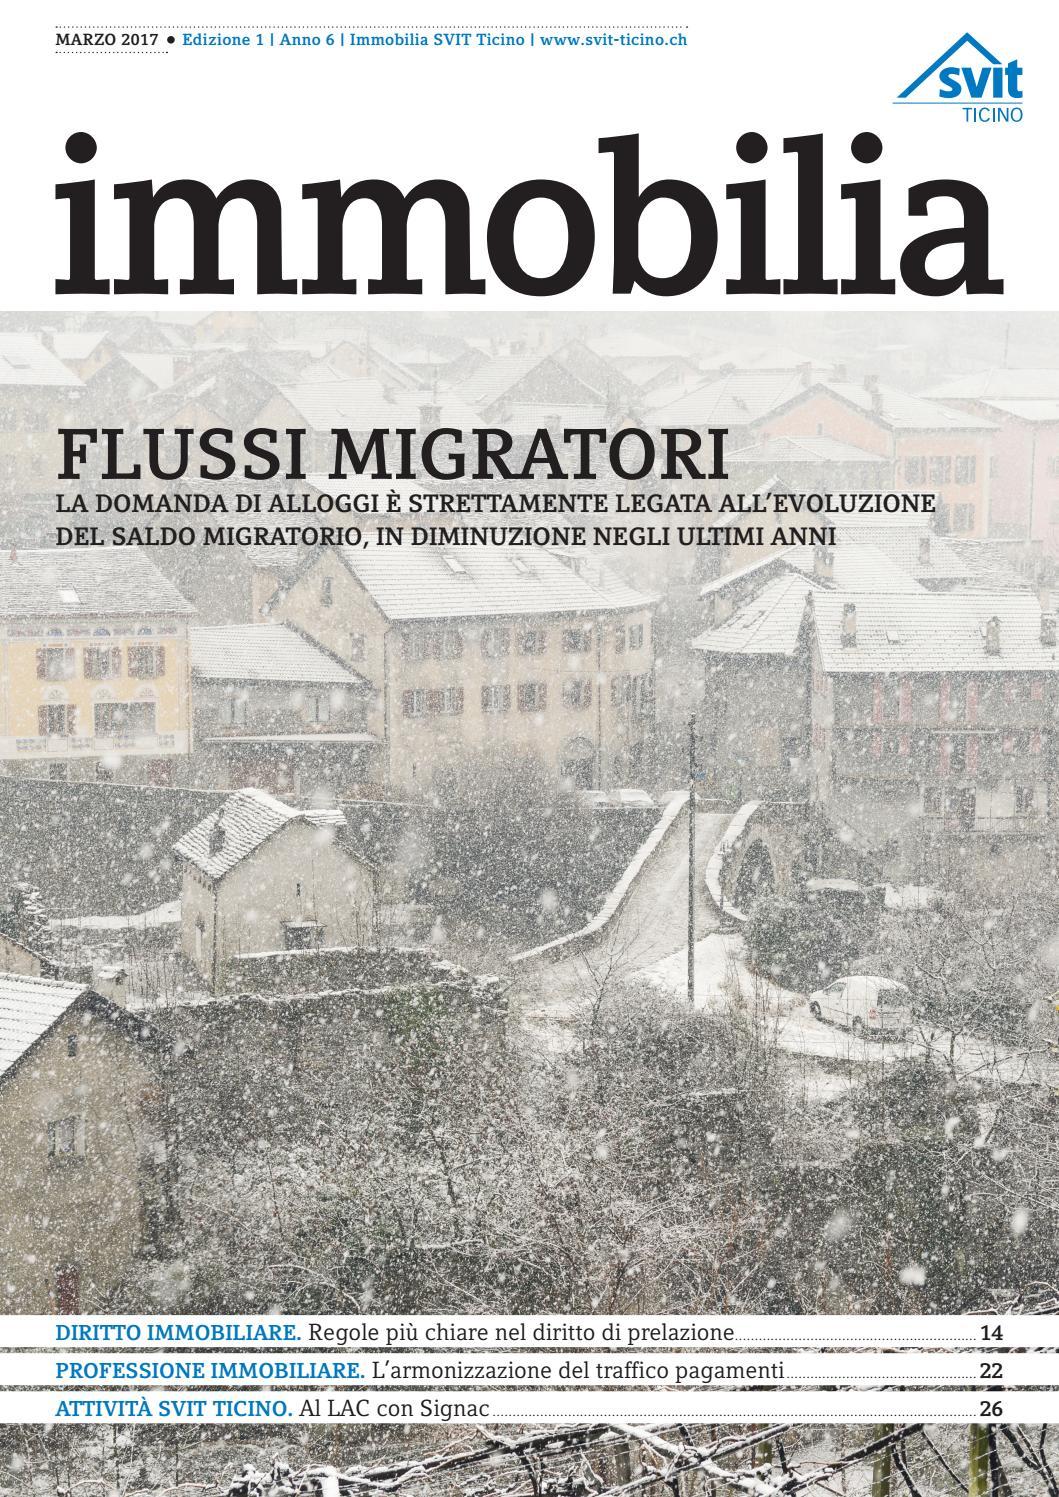 Svit Immobilia Marzo 2017 By Svit Ticino Issuu